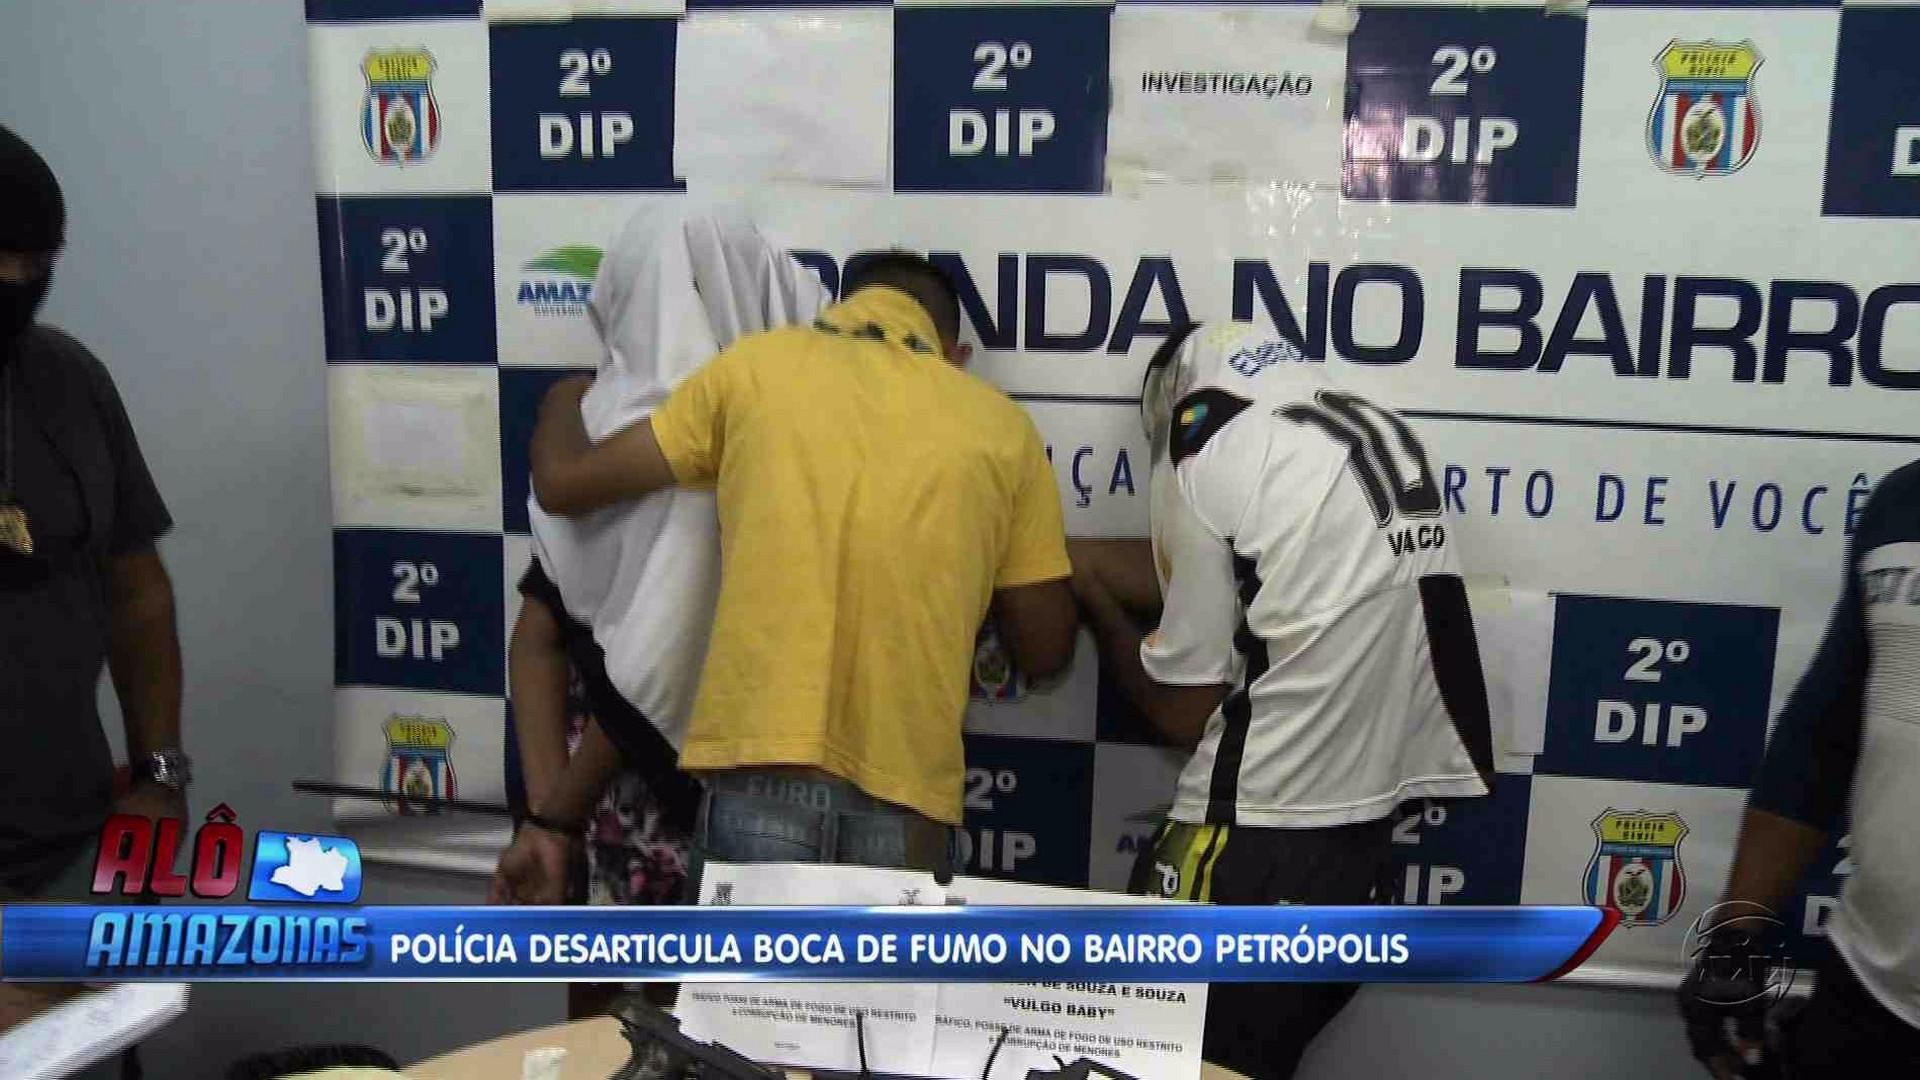 POLÍCIA DESARTICULA BOCA DE FUMO NO BAIRRO PETRÓPOLIS - Alô Amazonas 17/11/17